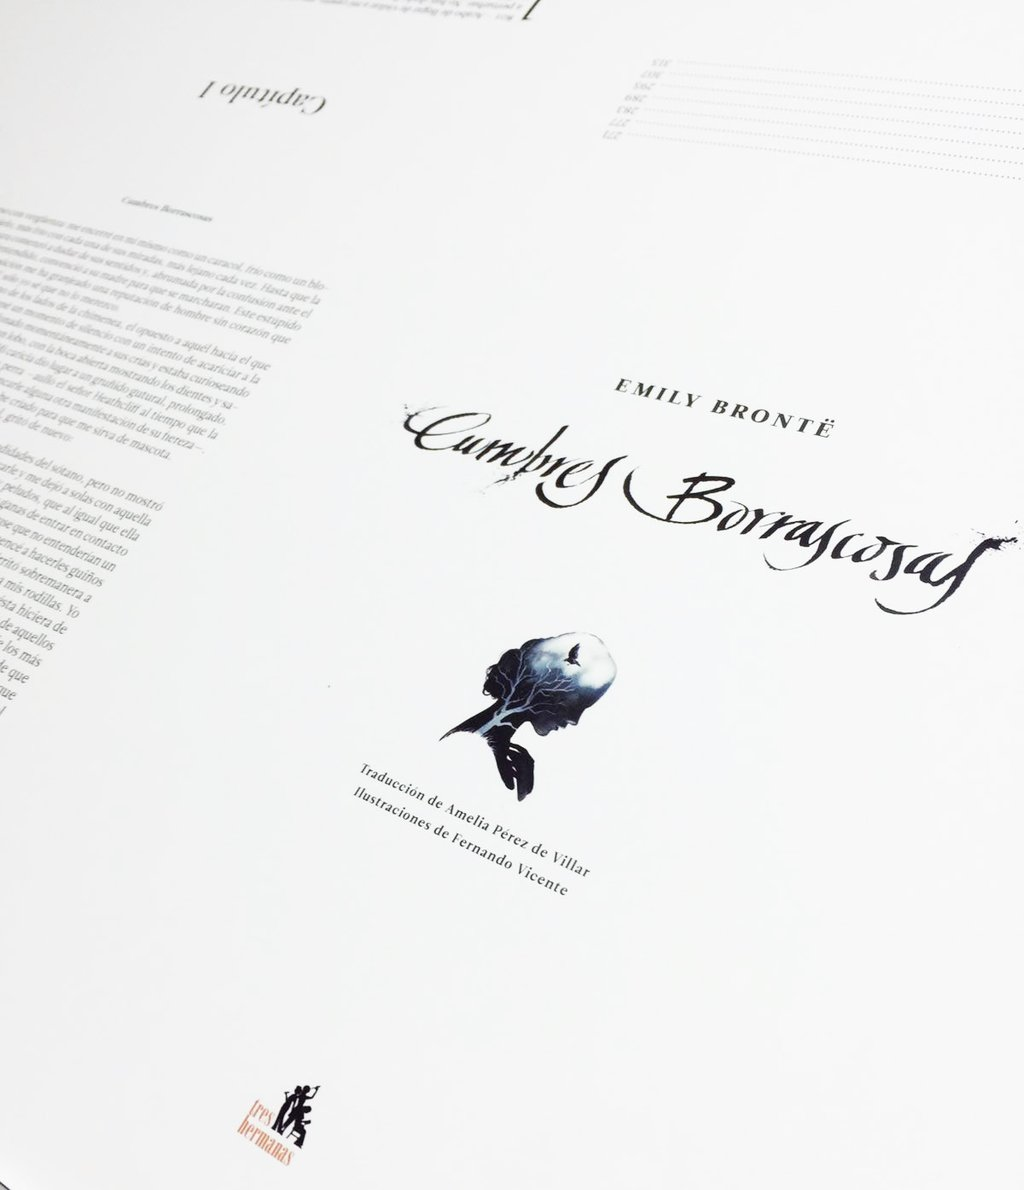 Cumbres Borrascosas Fernando Vicente en imprenta